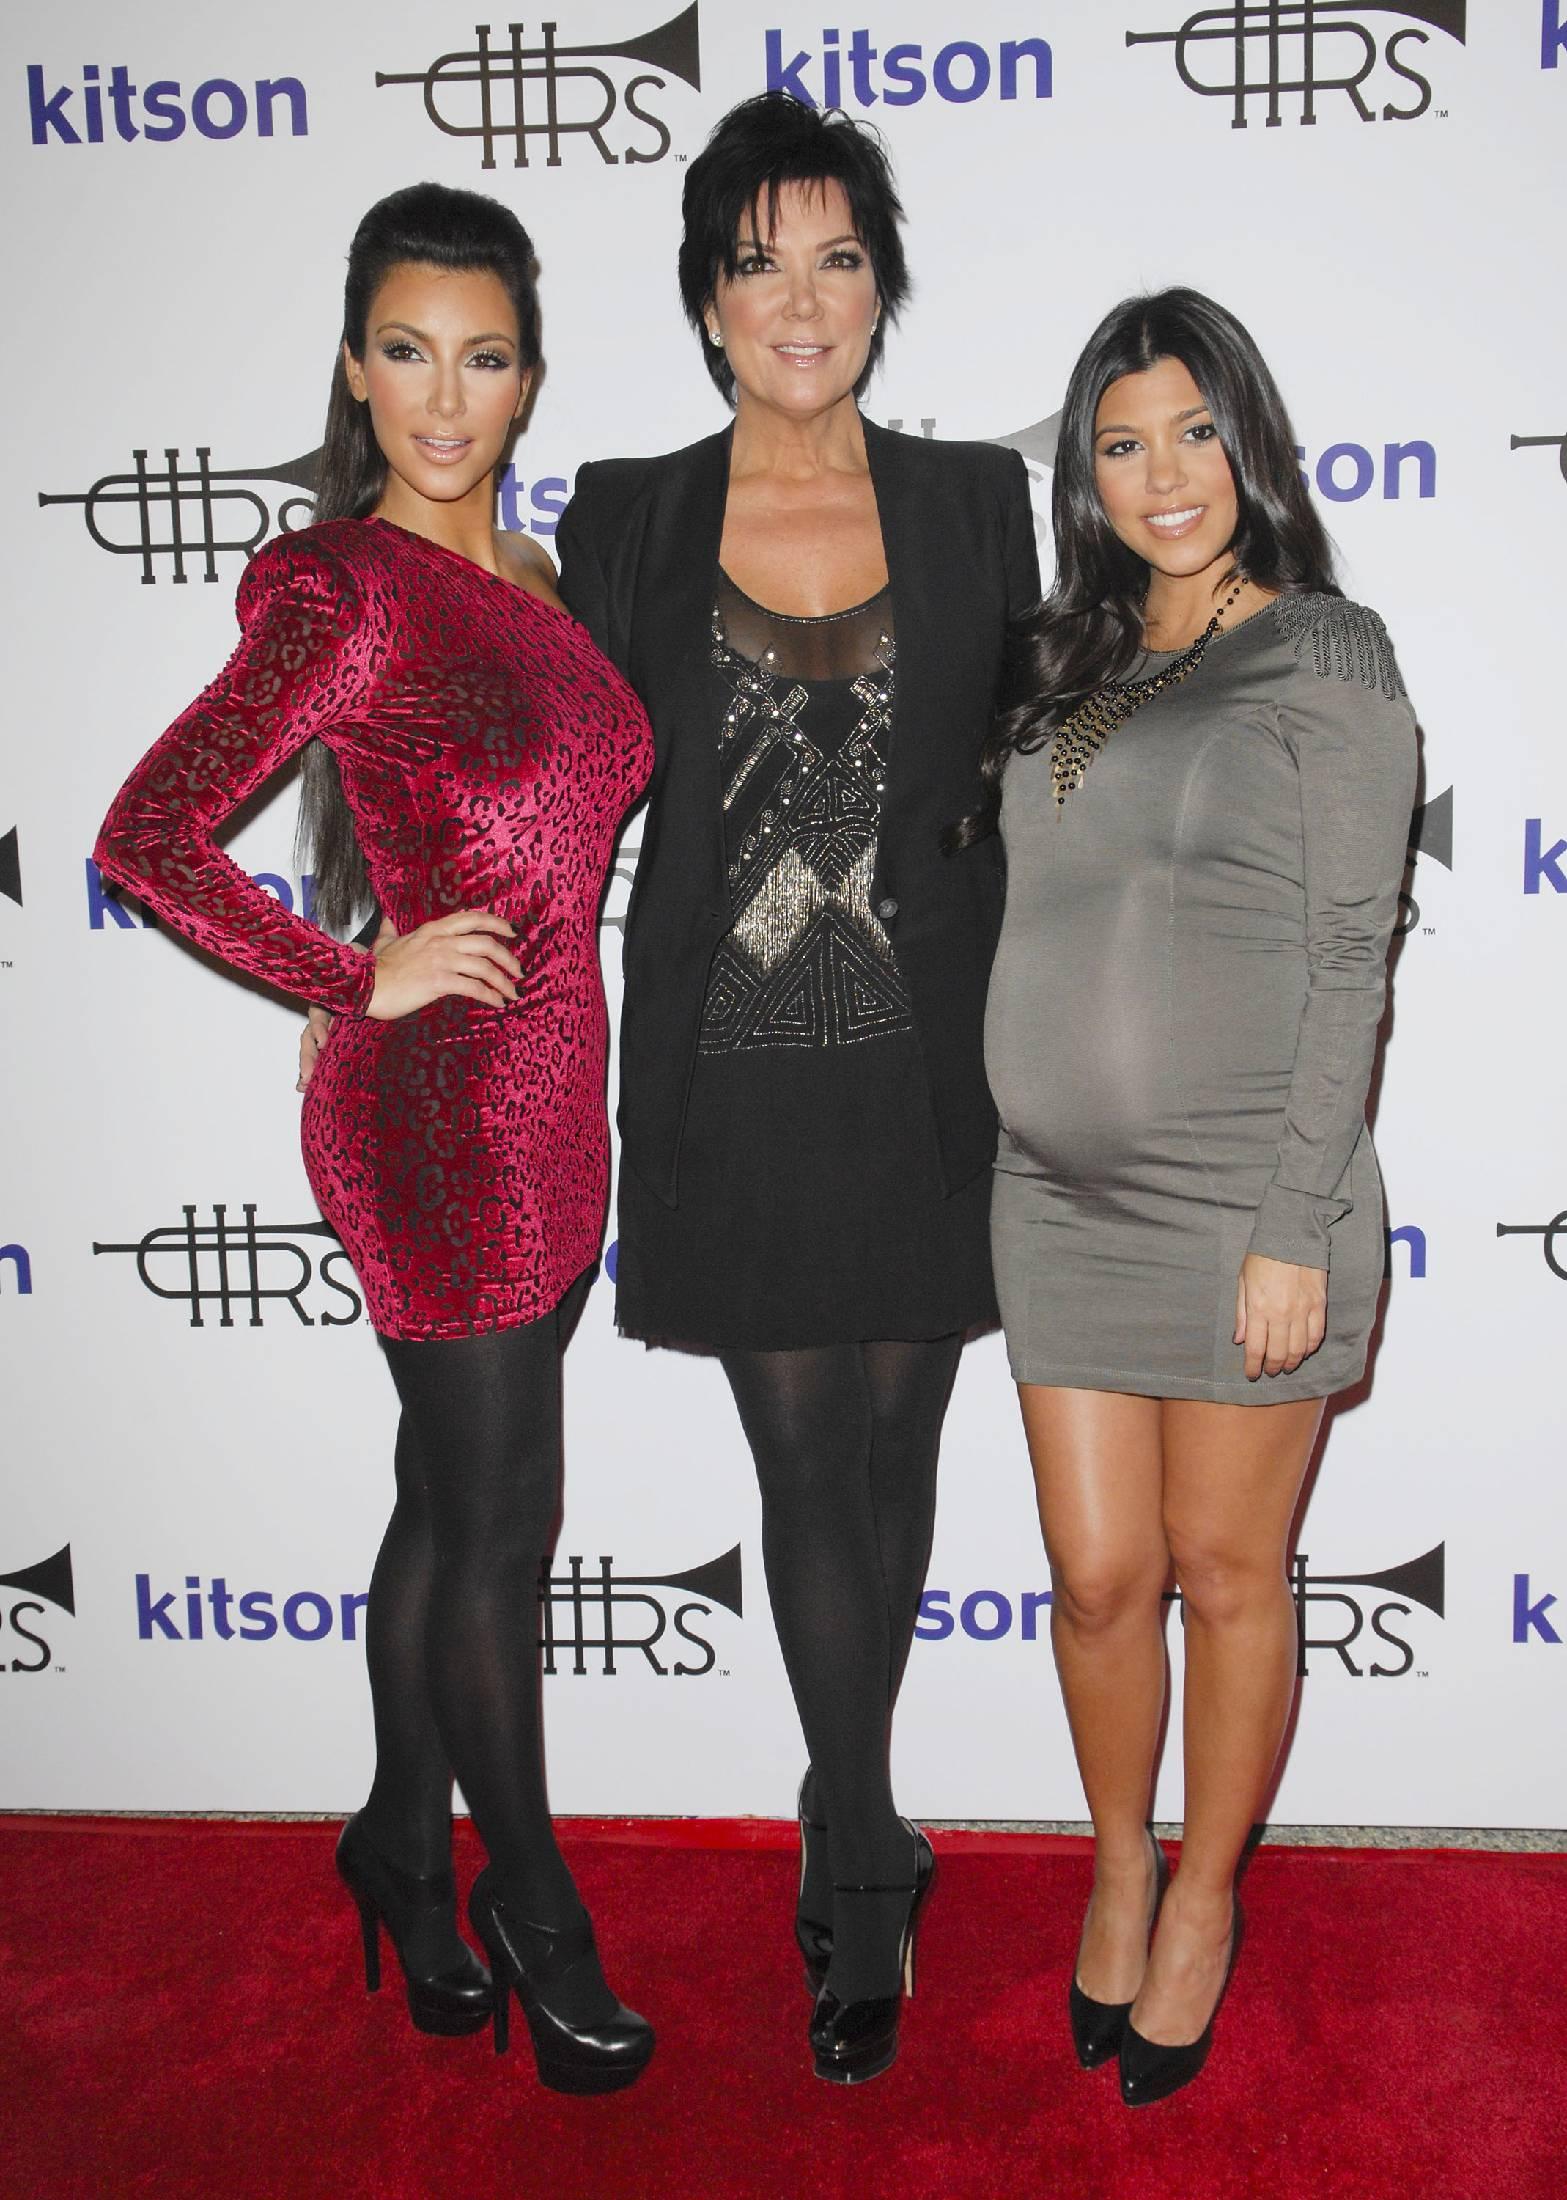 44983_Kim_Kardashian_05_122_544lo.jpg